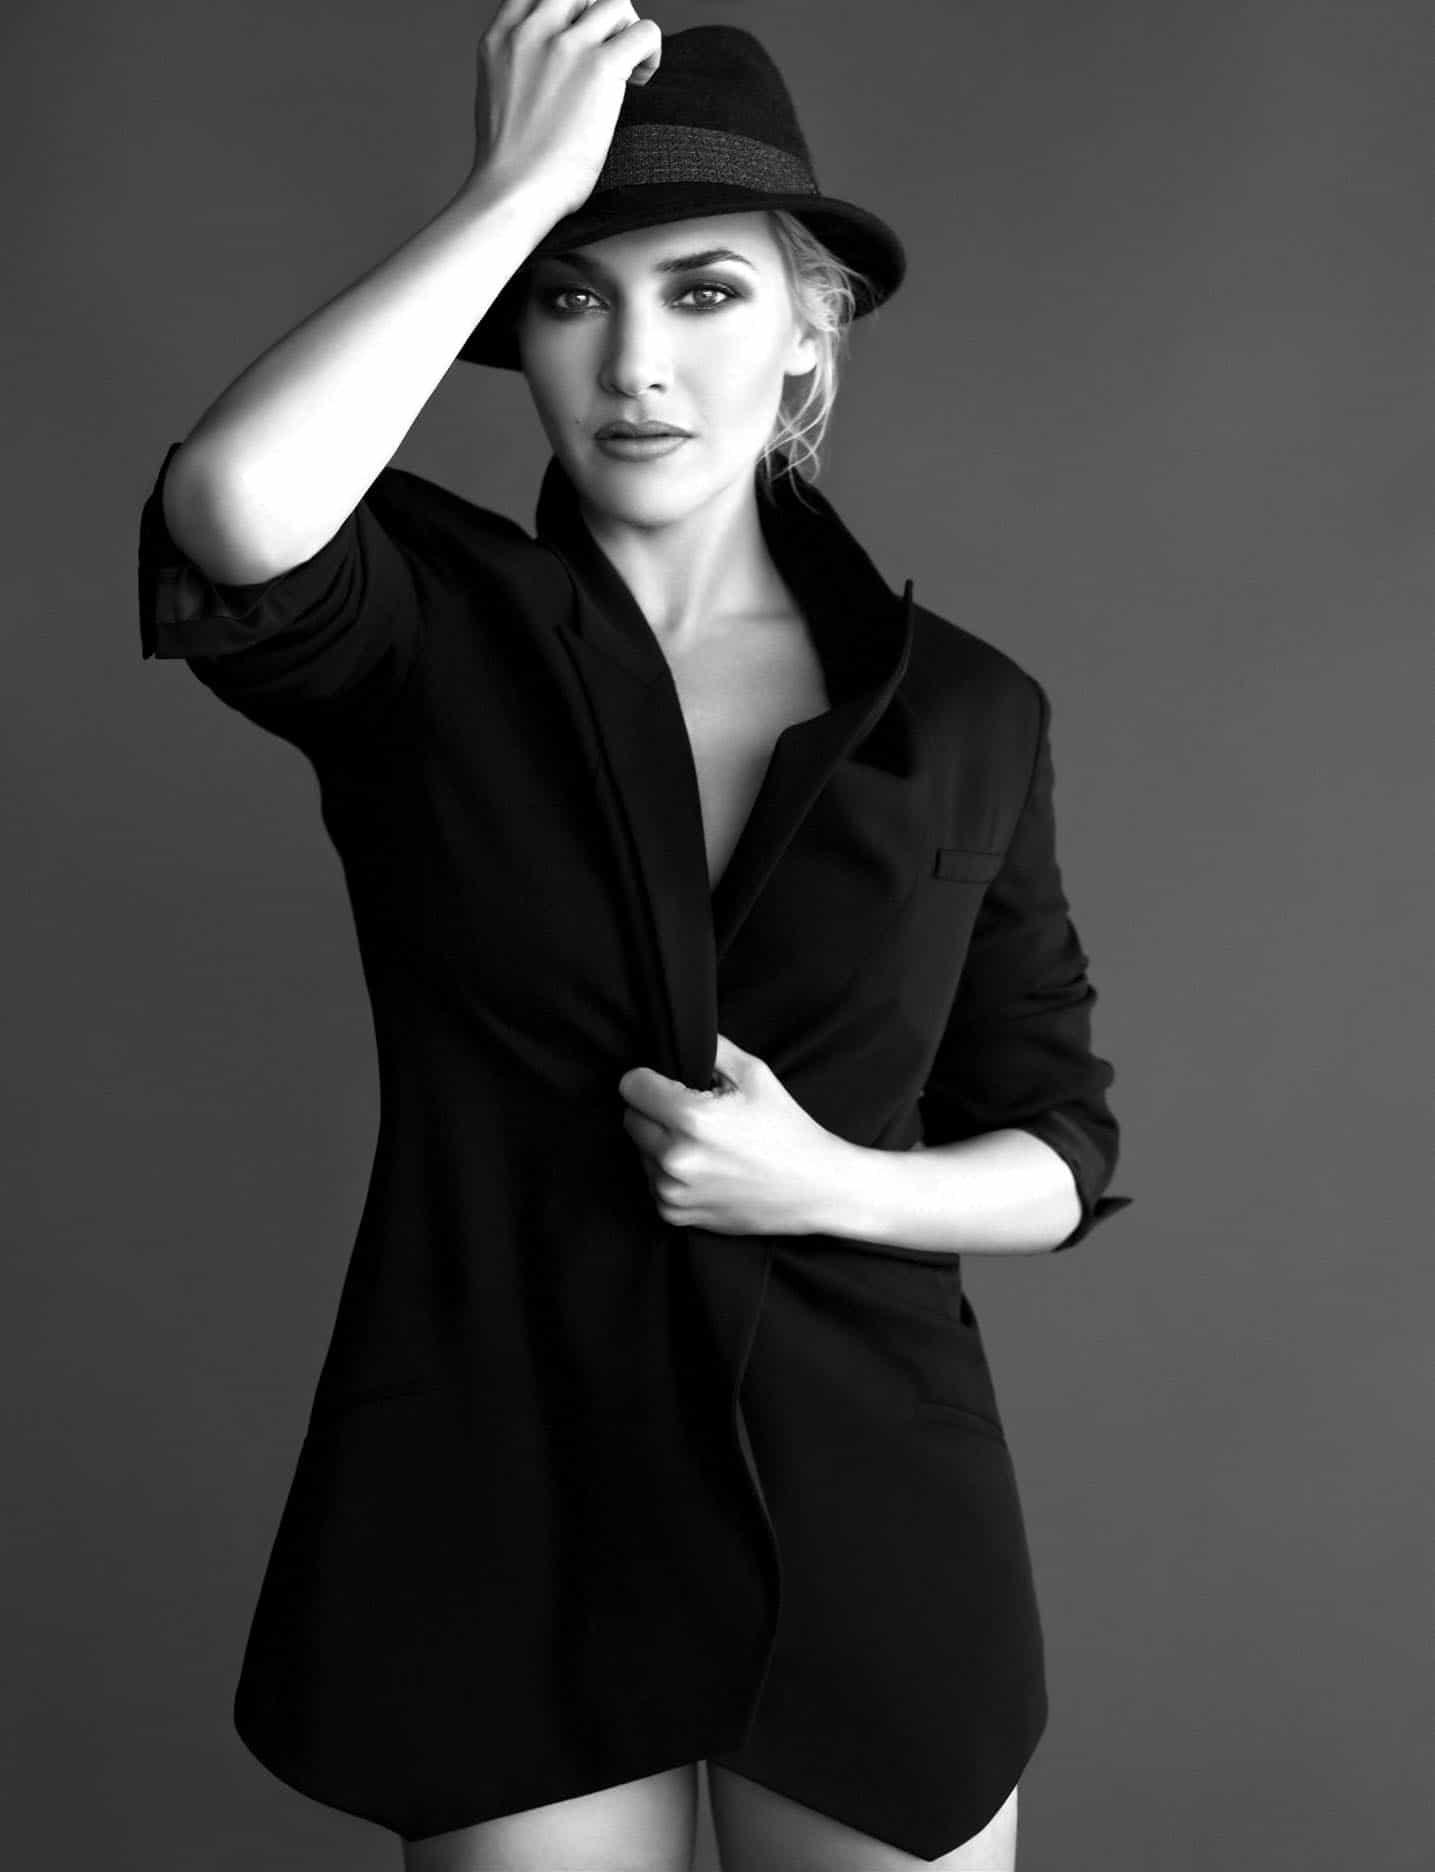 Kate Winslet2, Hay una lesbiana en mi sopa